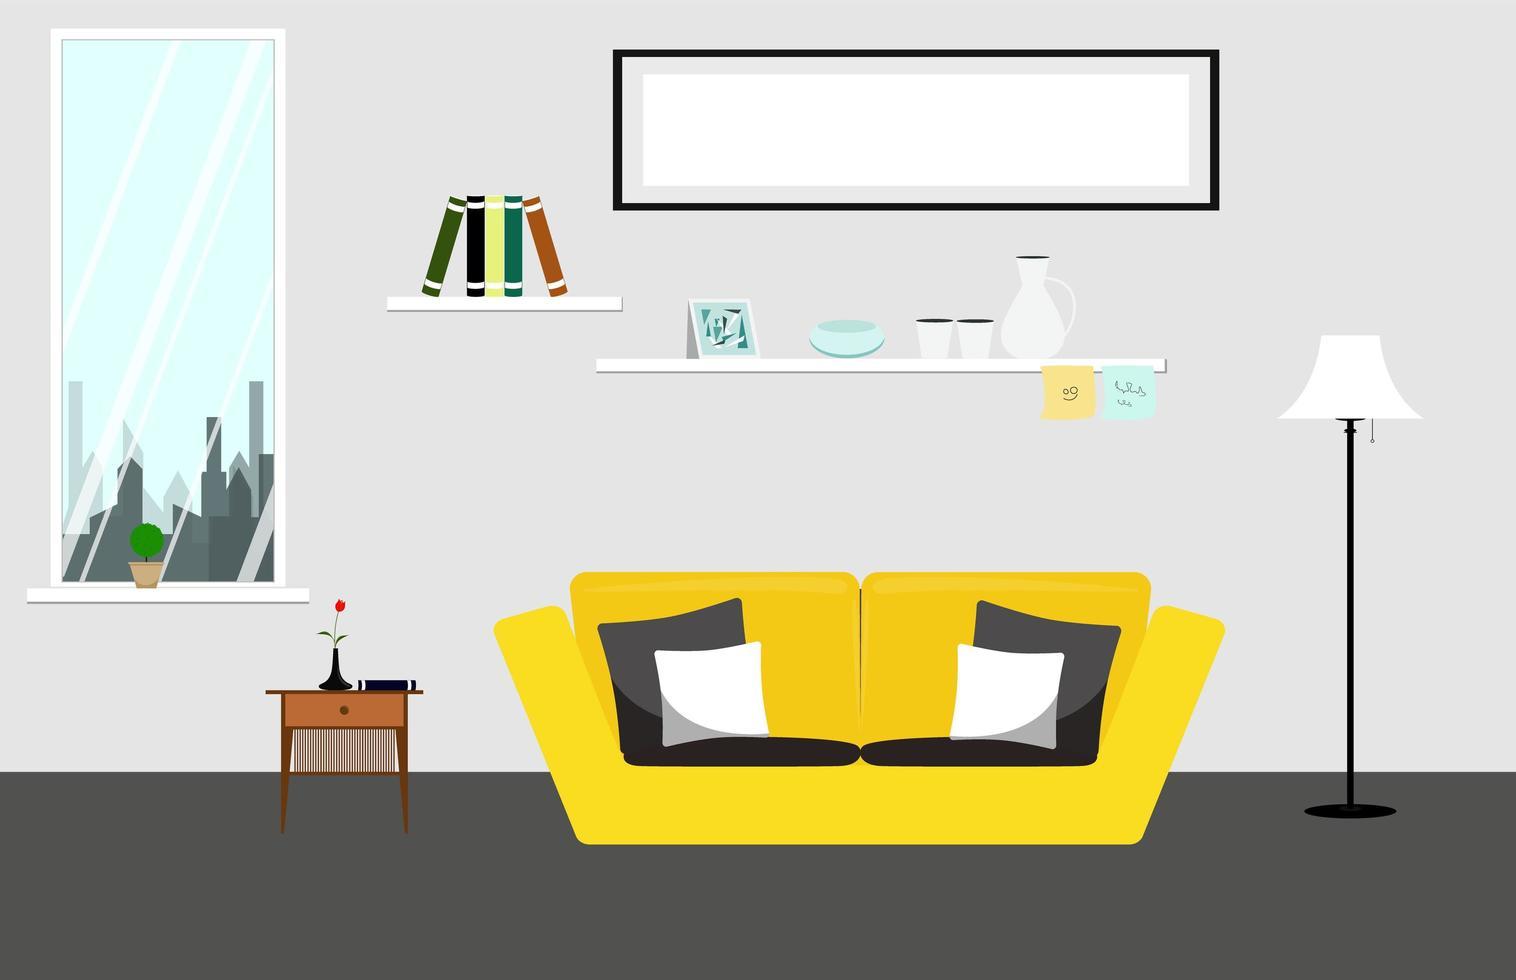 sala de estar de estilo plano con sofá amarillo vector